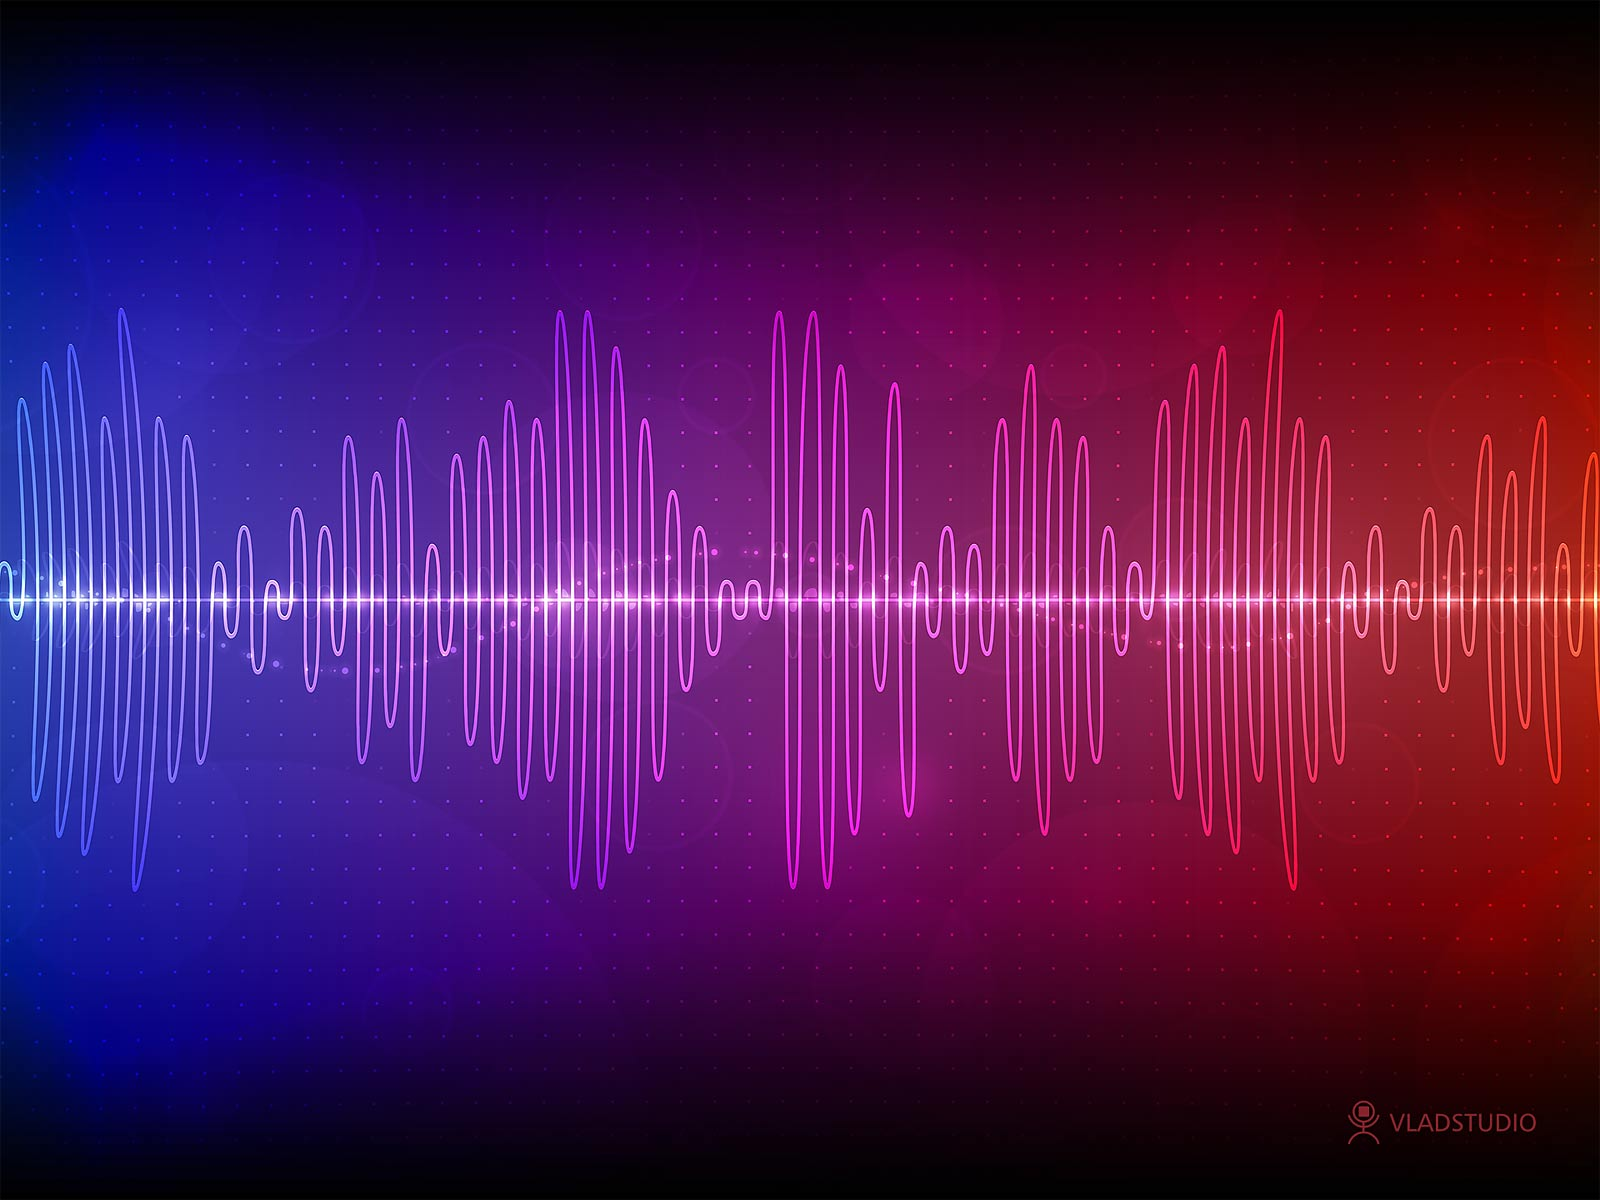 Sound_Wave_by_vladstudio.jpg